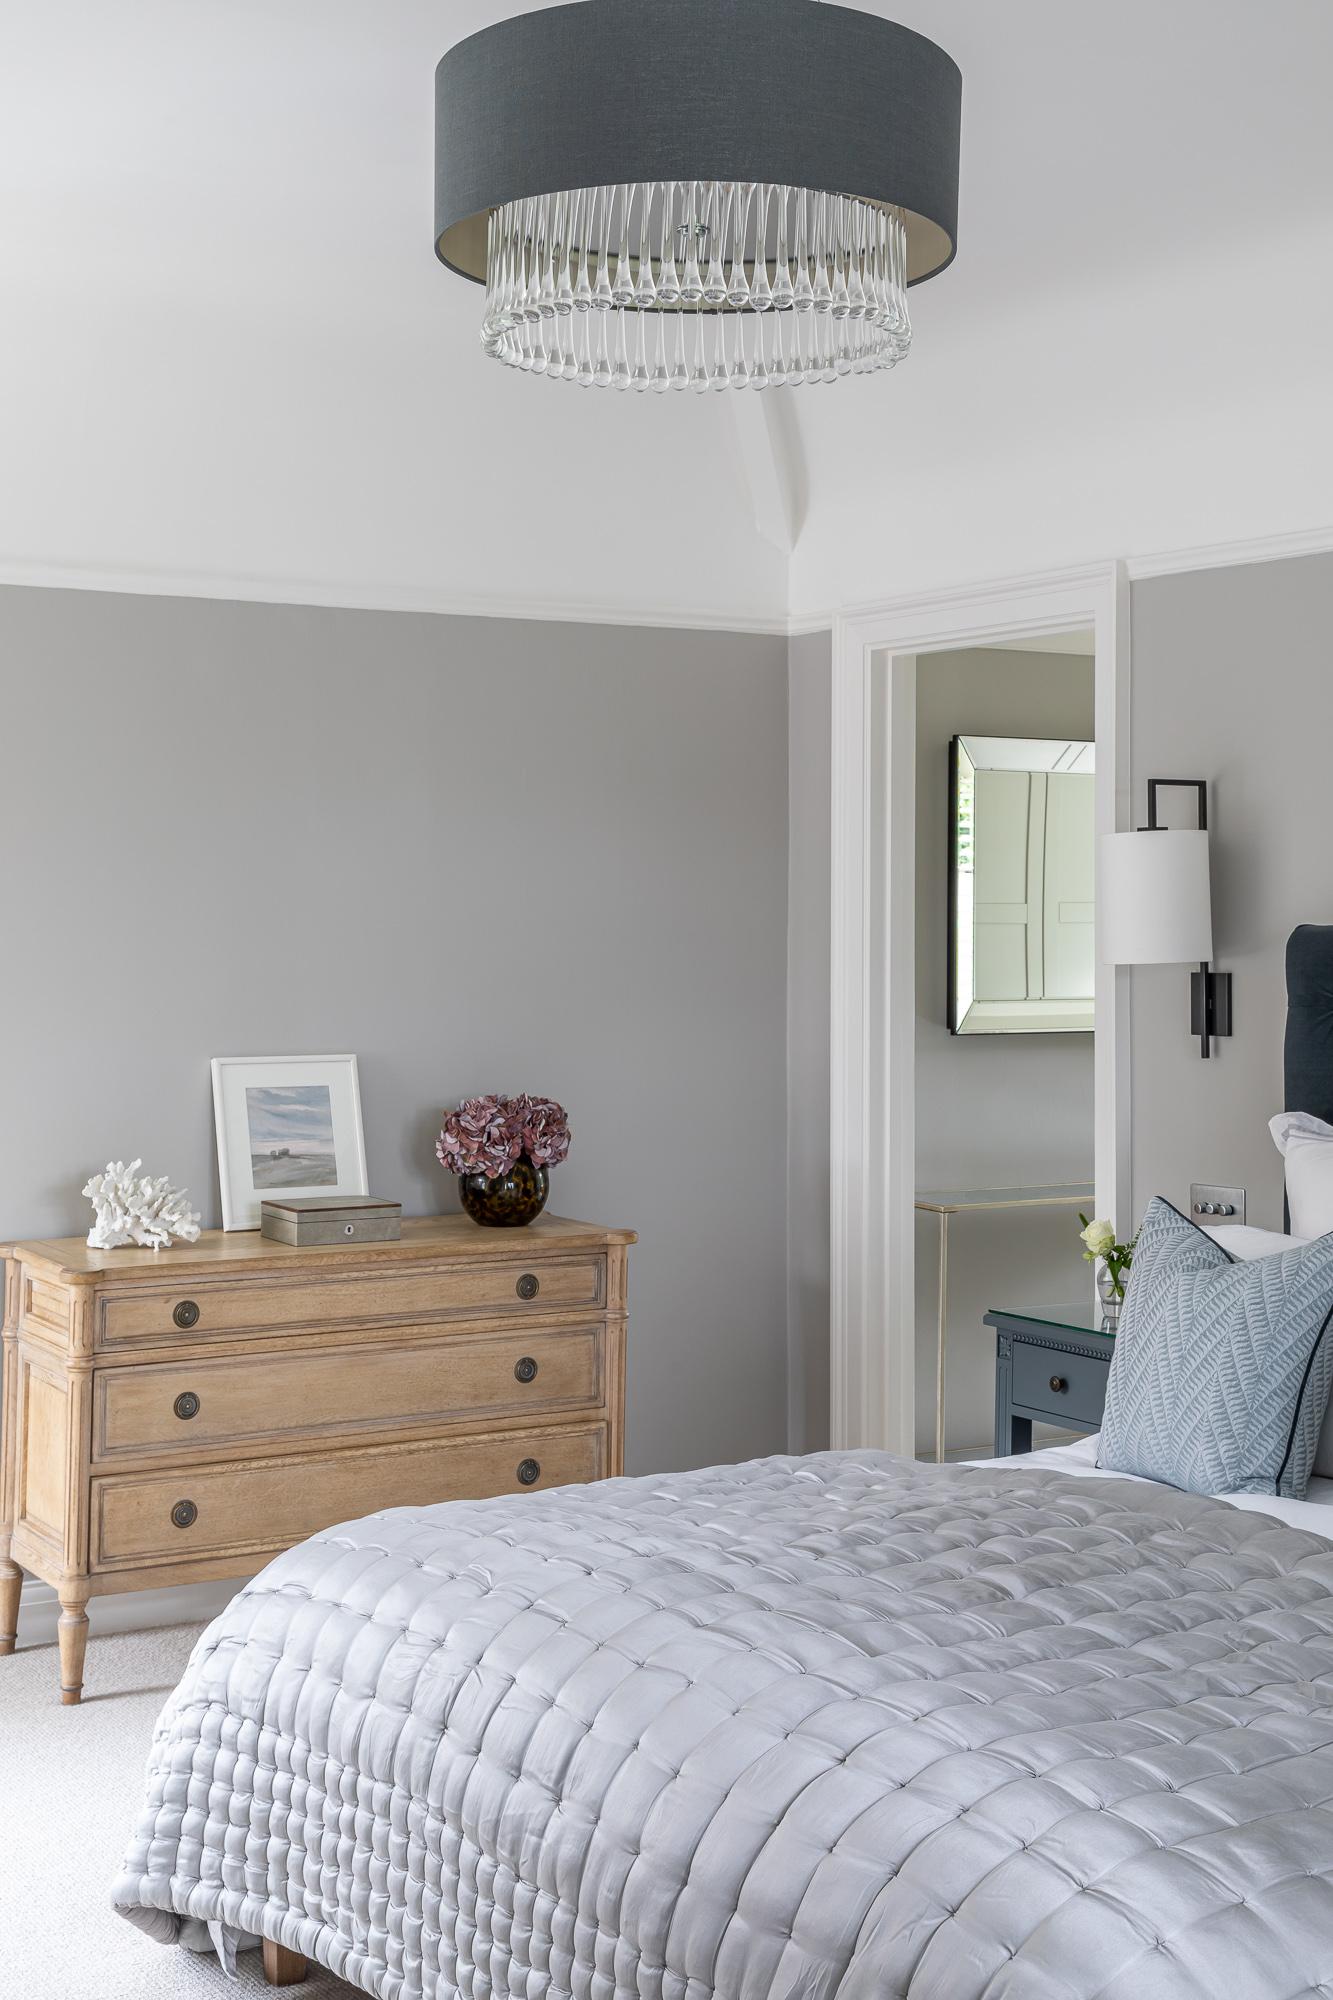 jonathan bond, interior photographer, bedroom light shade, great missenden, buckinghamshire